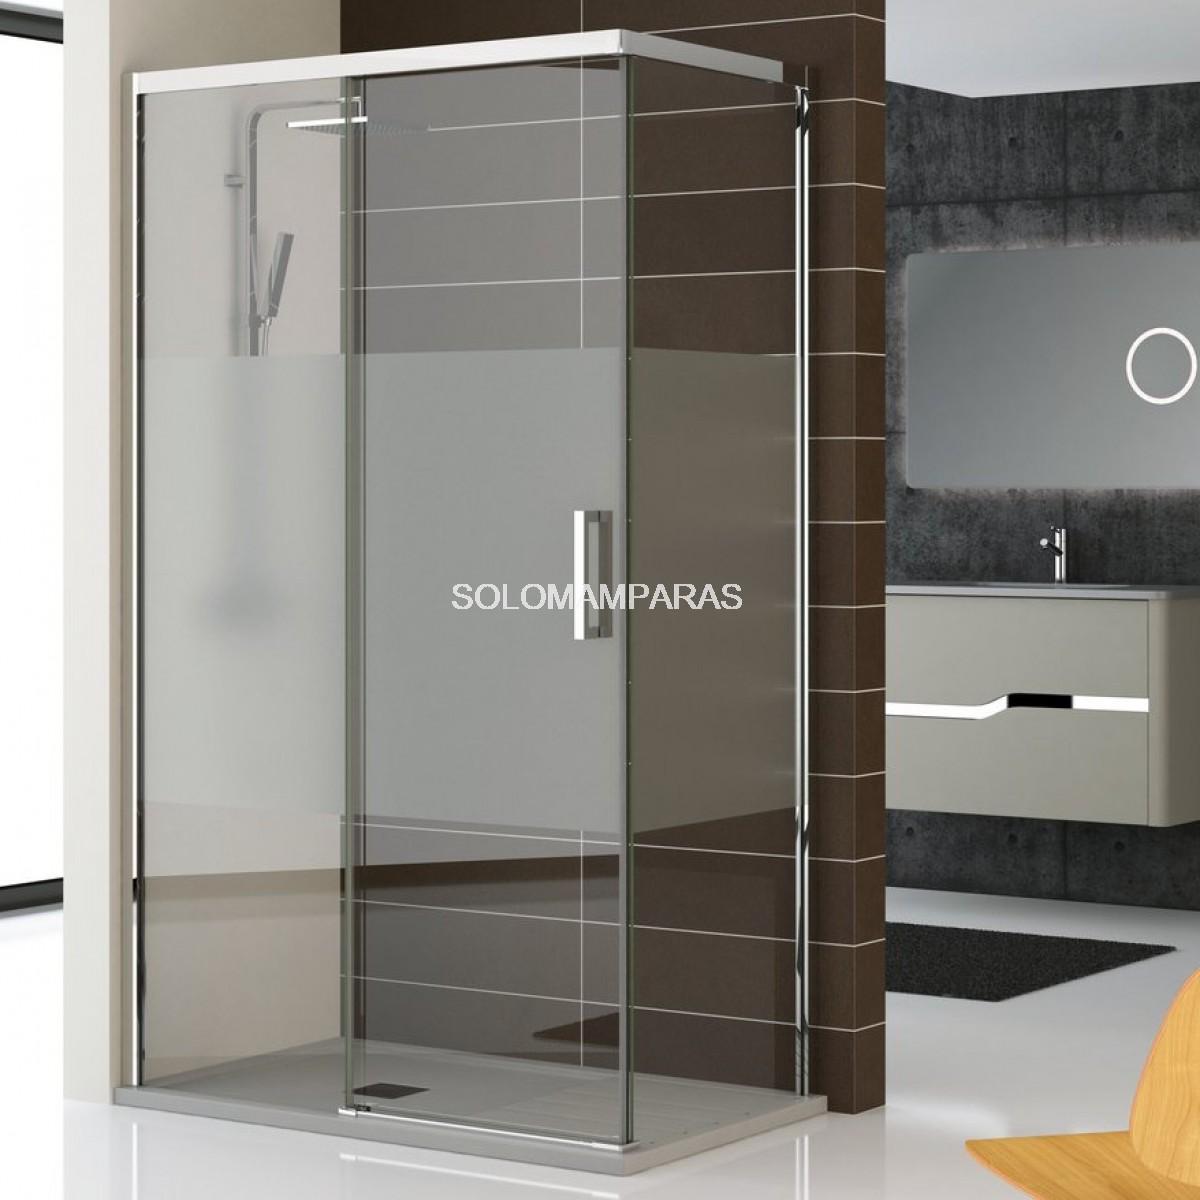 Mampara ducha sin perfil inferior lyon 1fija 1corredera for Mamparas de ducha correderas sin perfiles